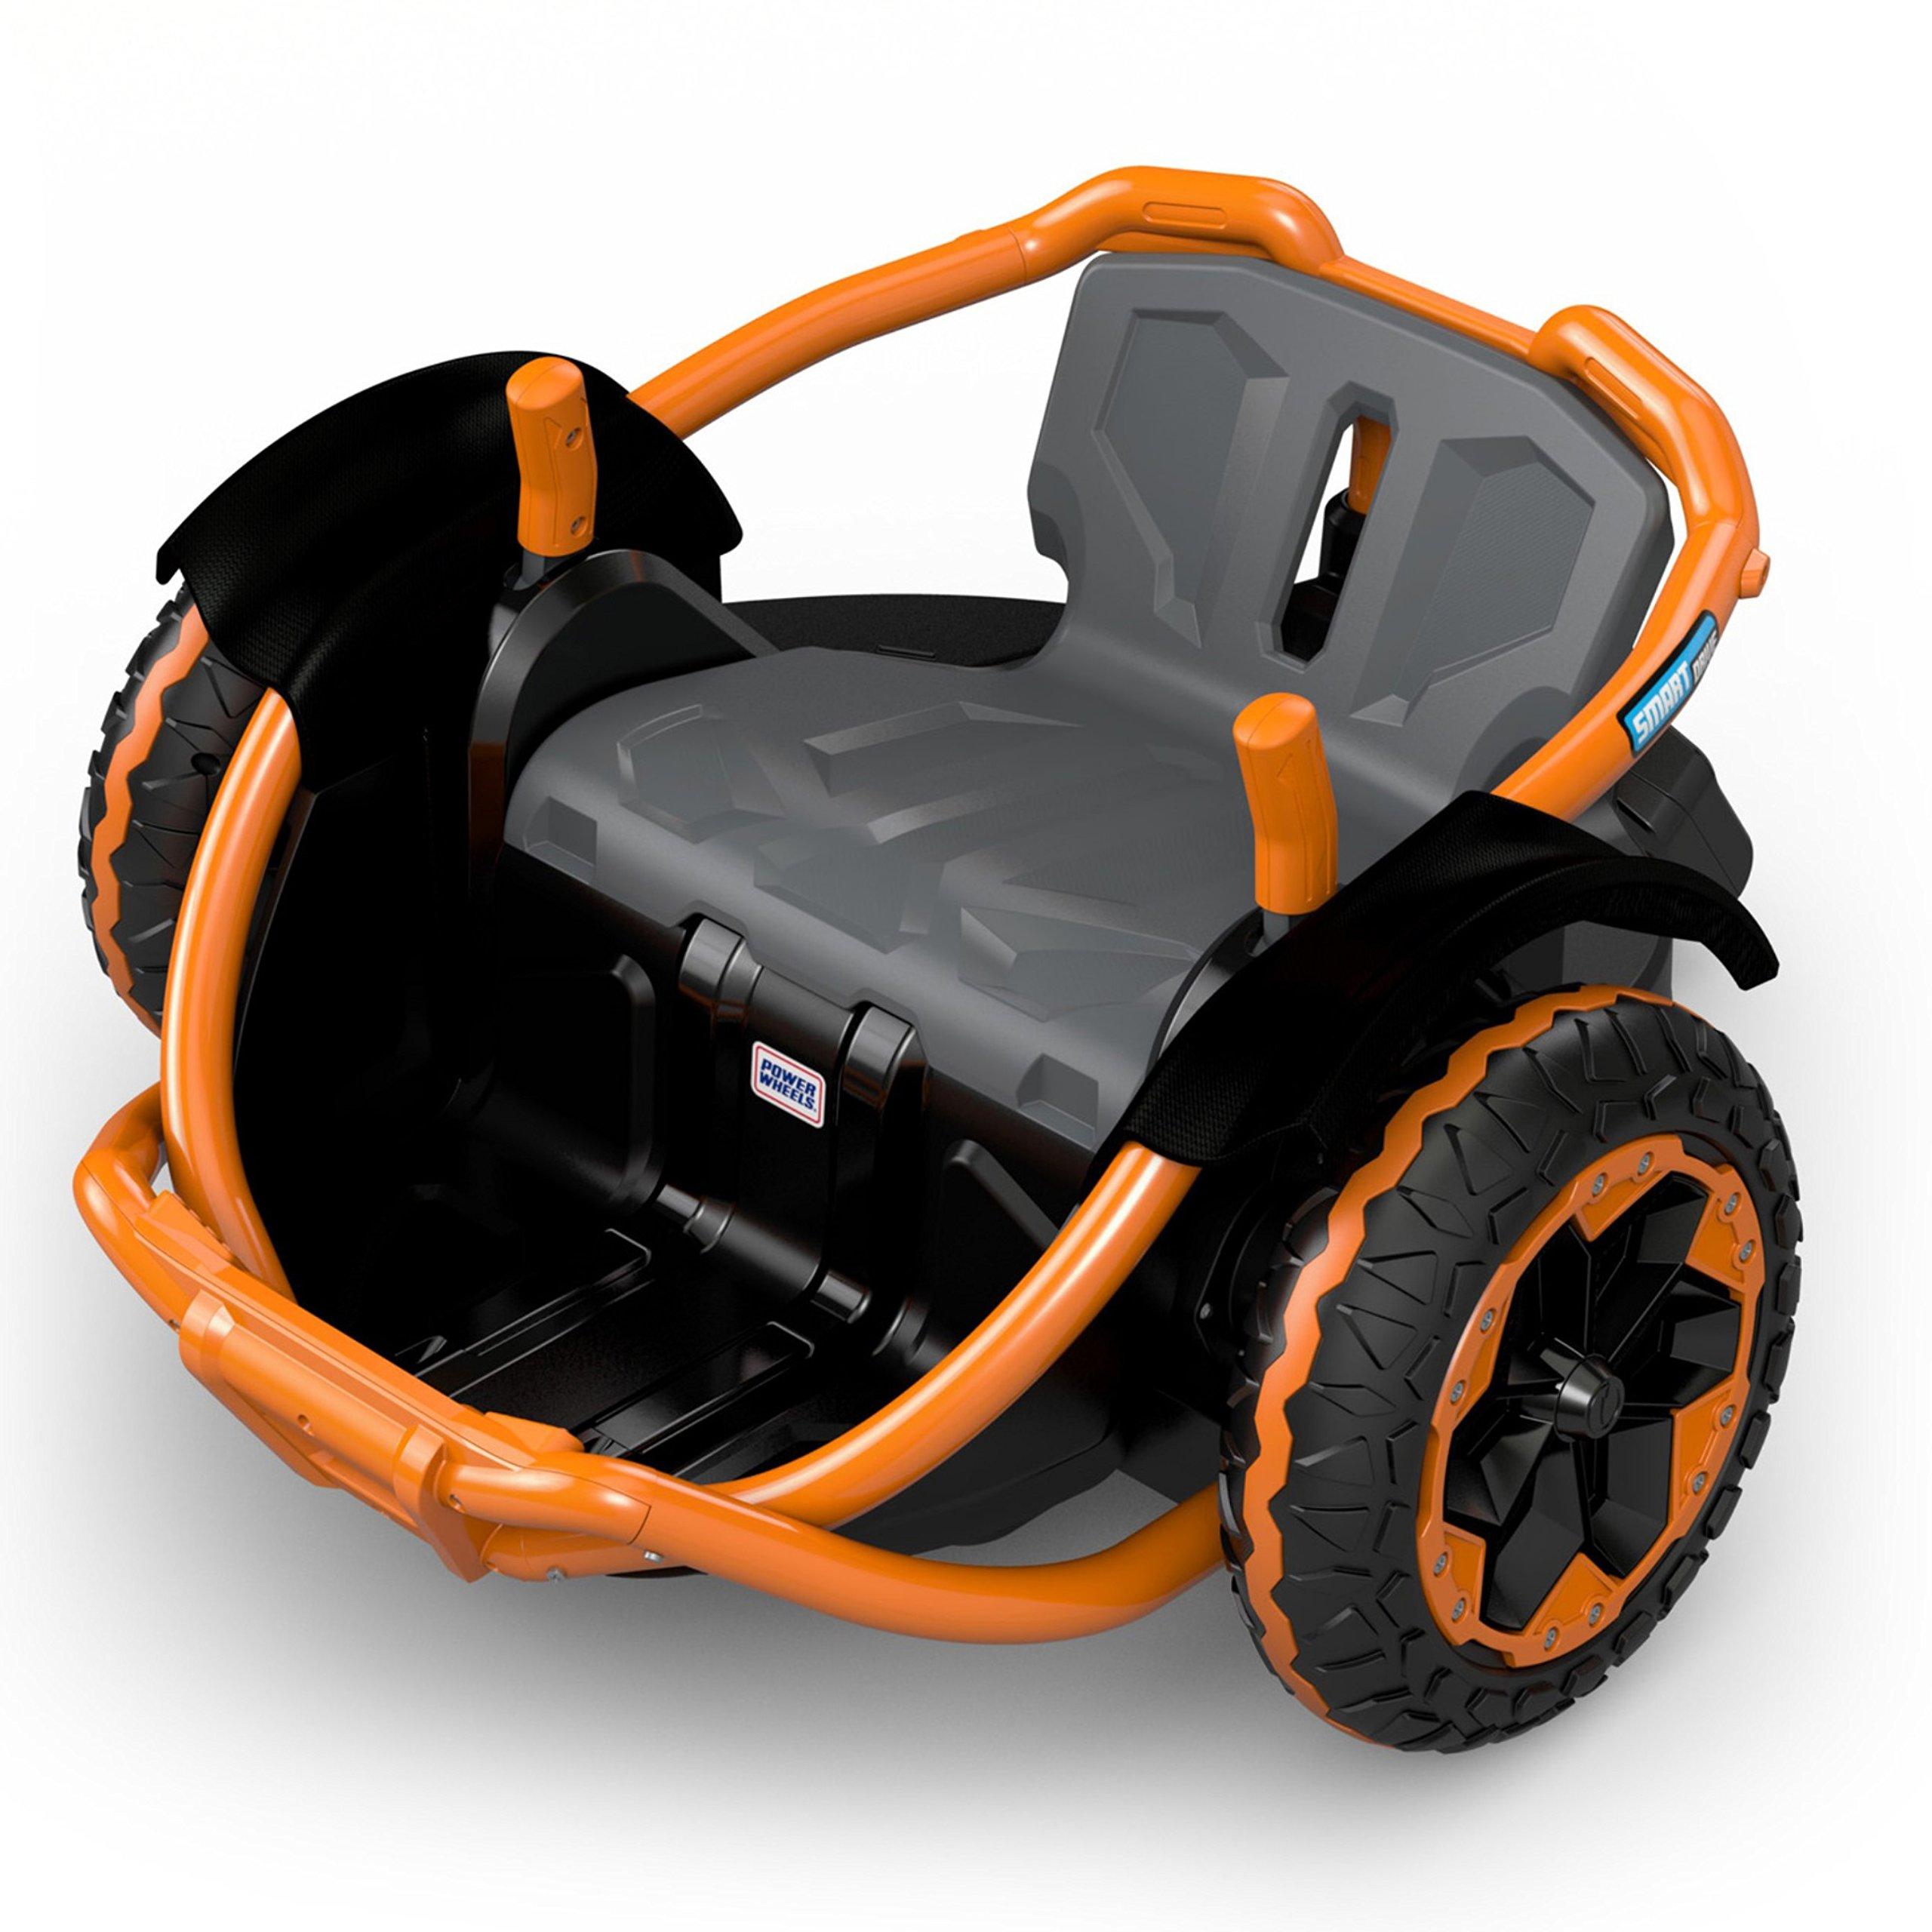 Power Wheels Wild Thing, Orange by Power Wheels (Image #3)